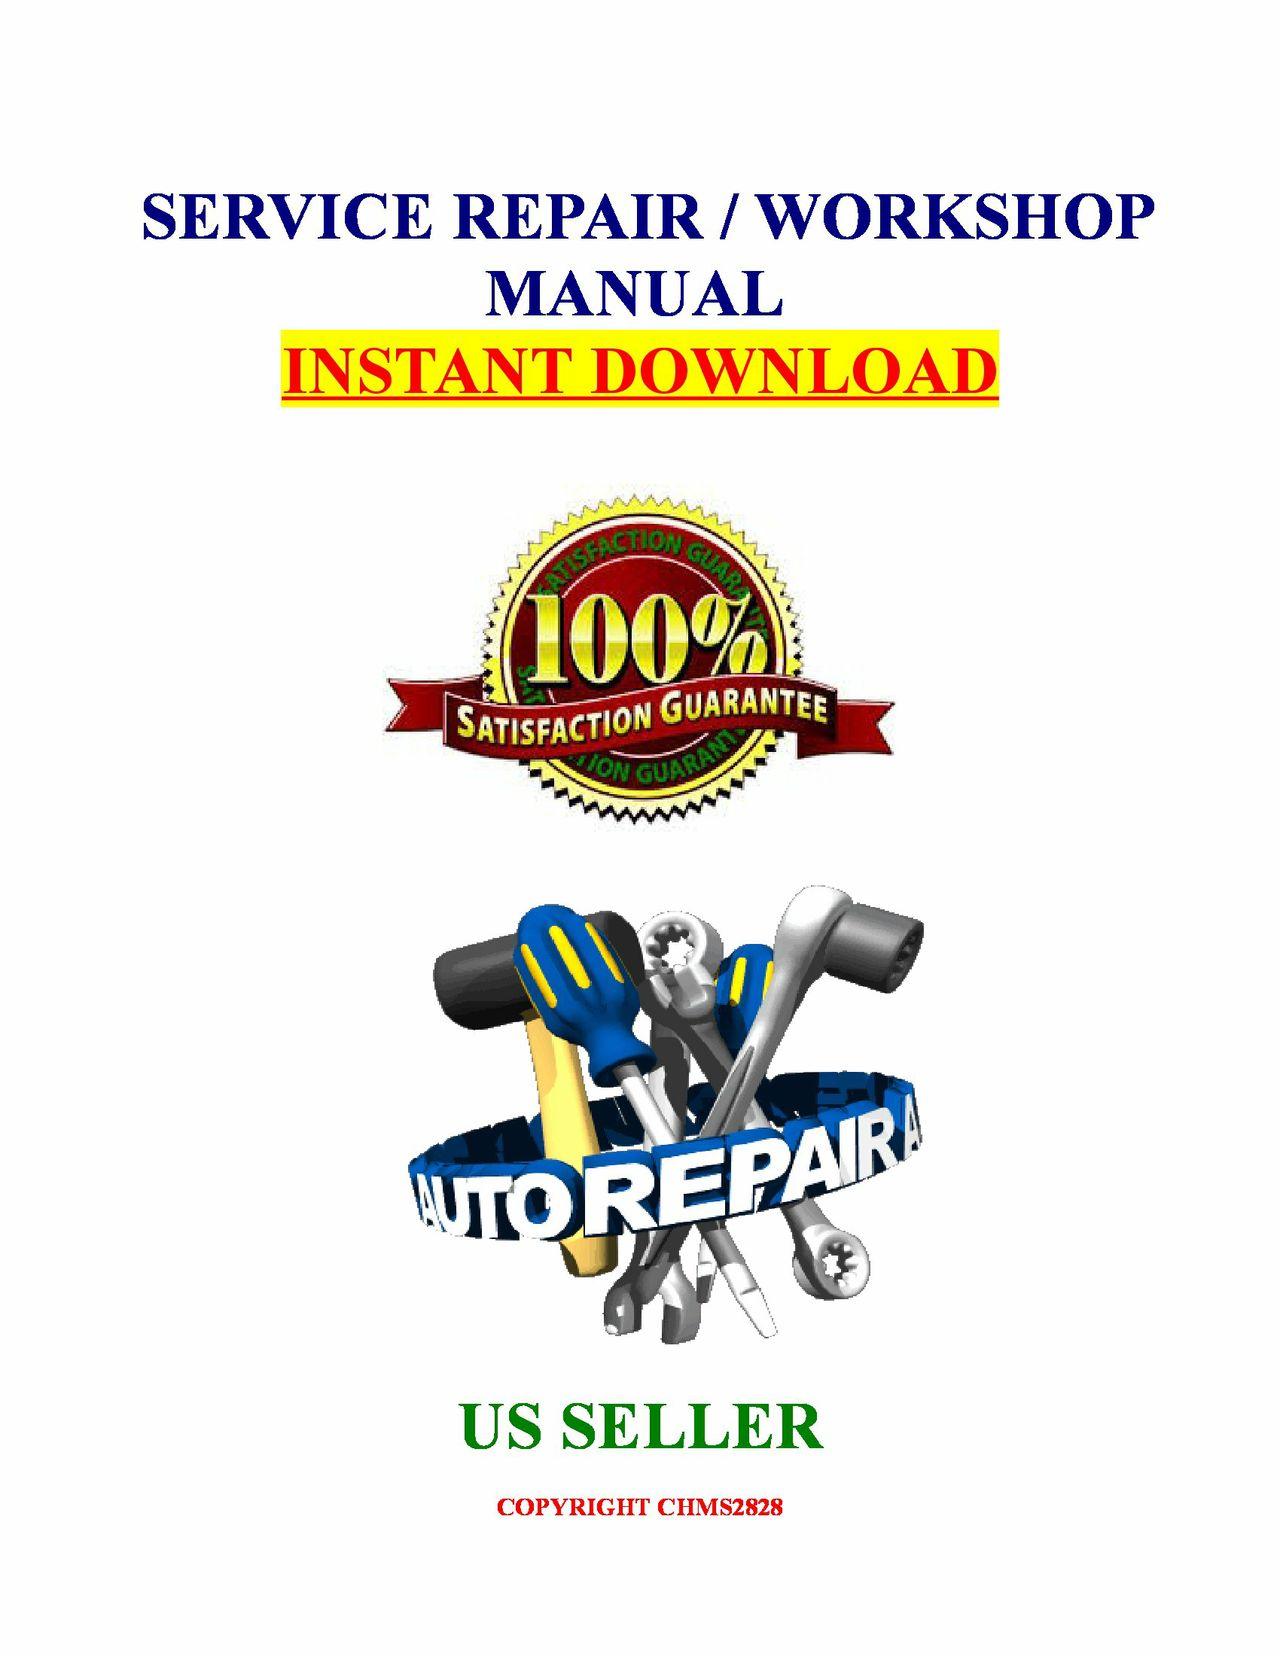 Ford Windstar Freestar Mercury Monterey 1995 1996 1997 1998 1999 2000 2001 Service Repair Manual